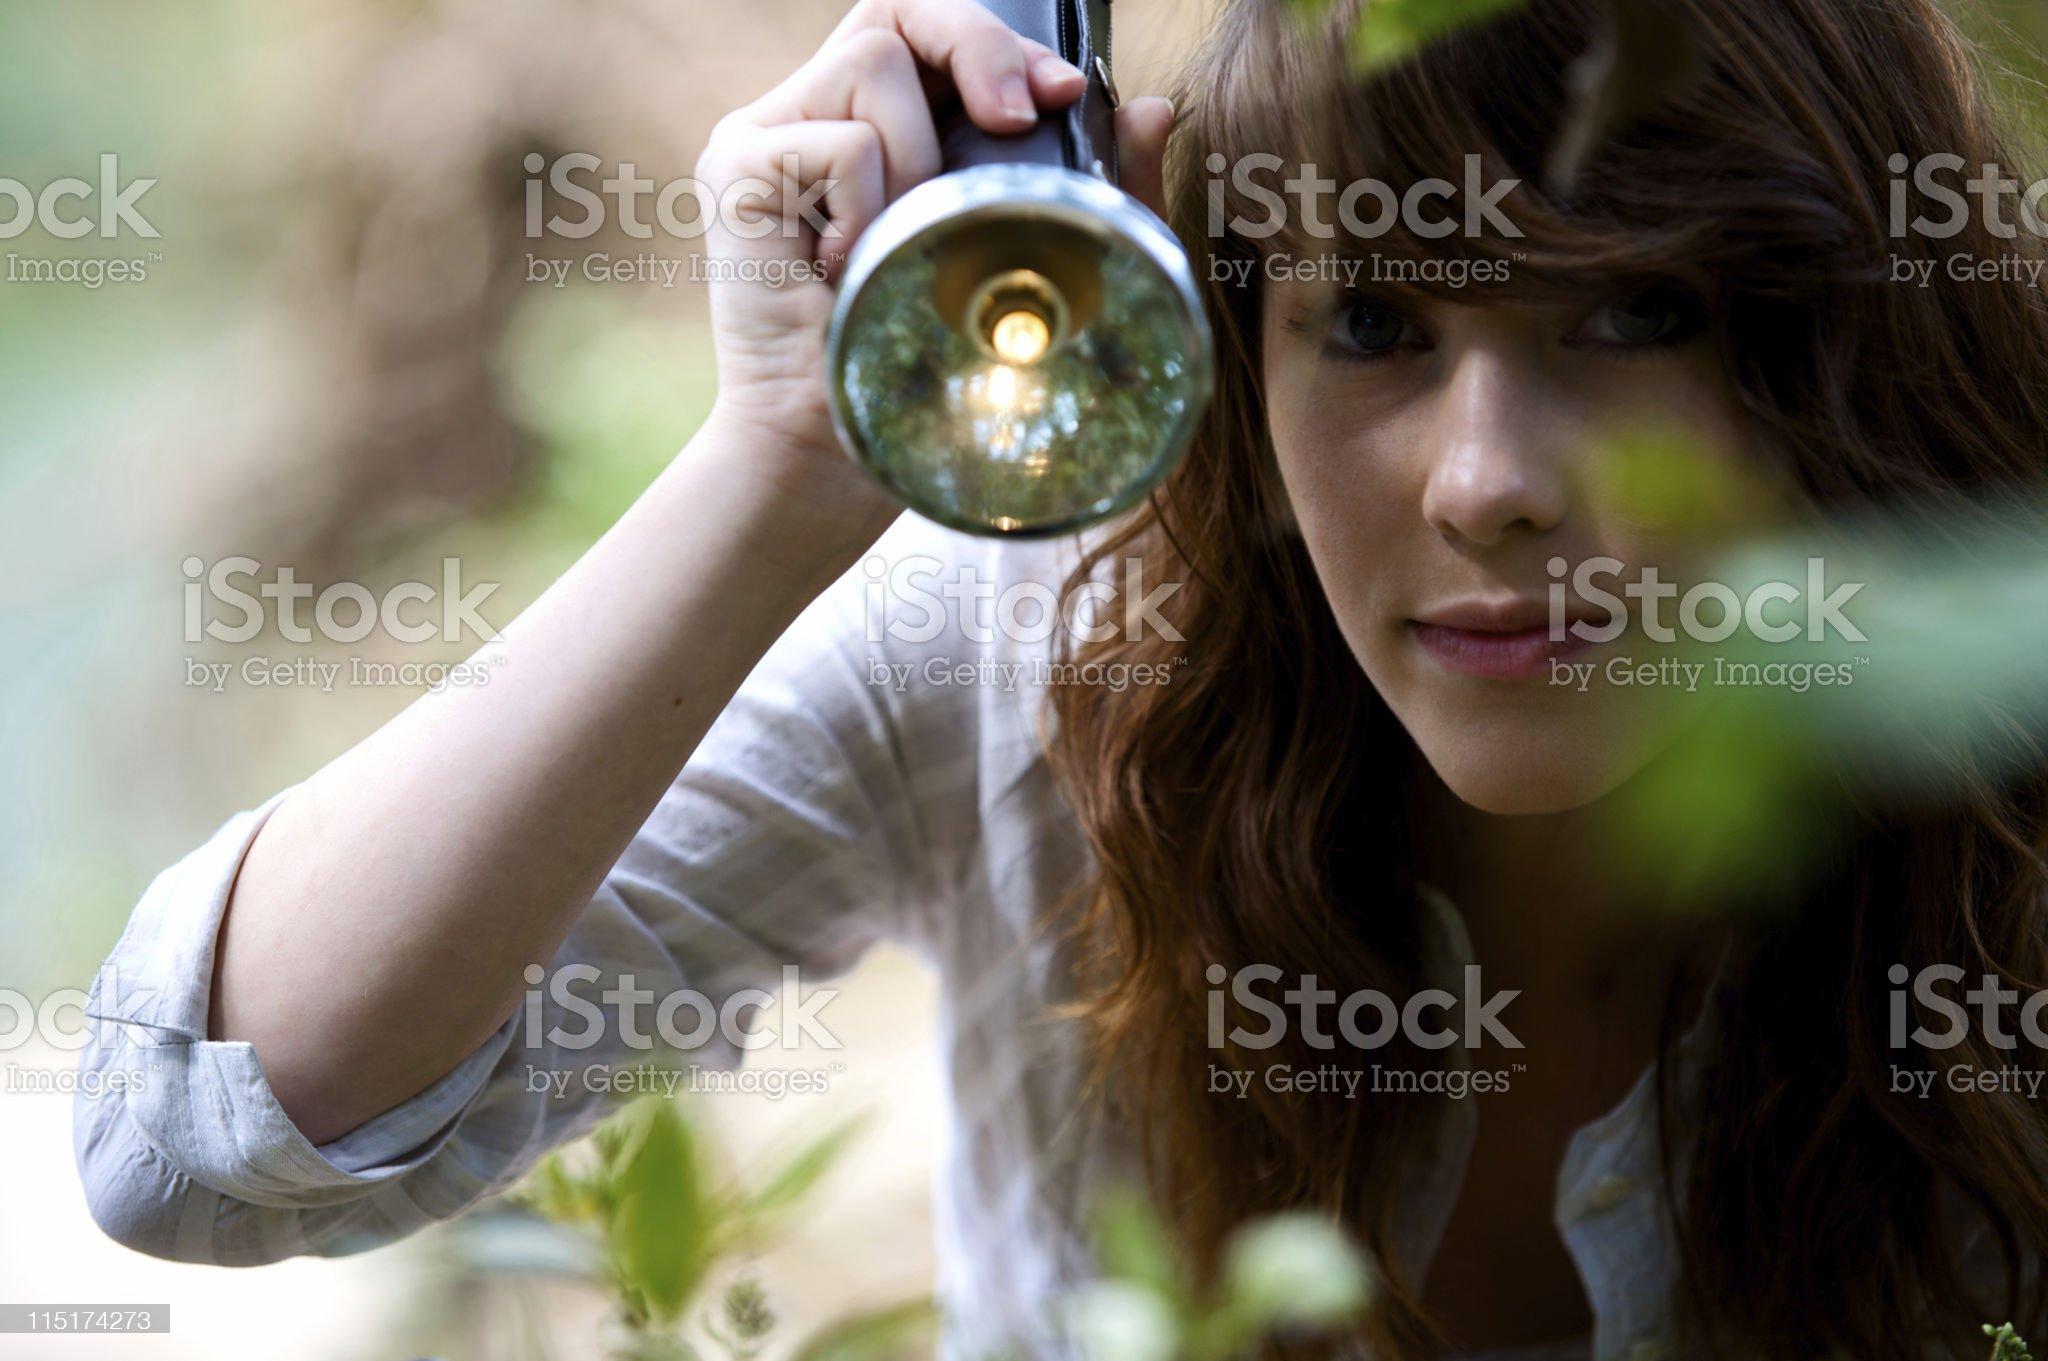 teen girl outdoor flashlight portraits royalty-free stock photo